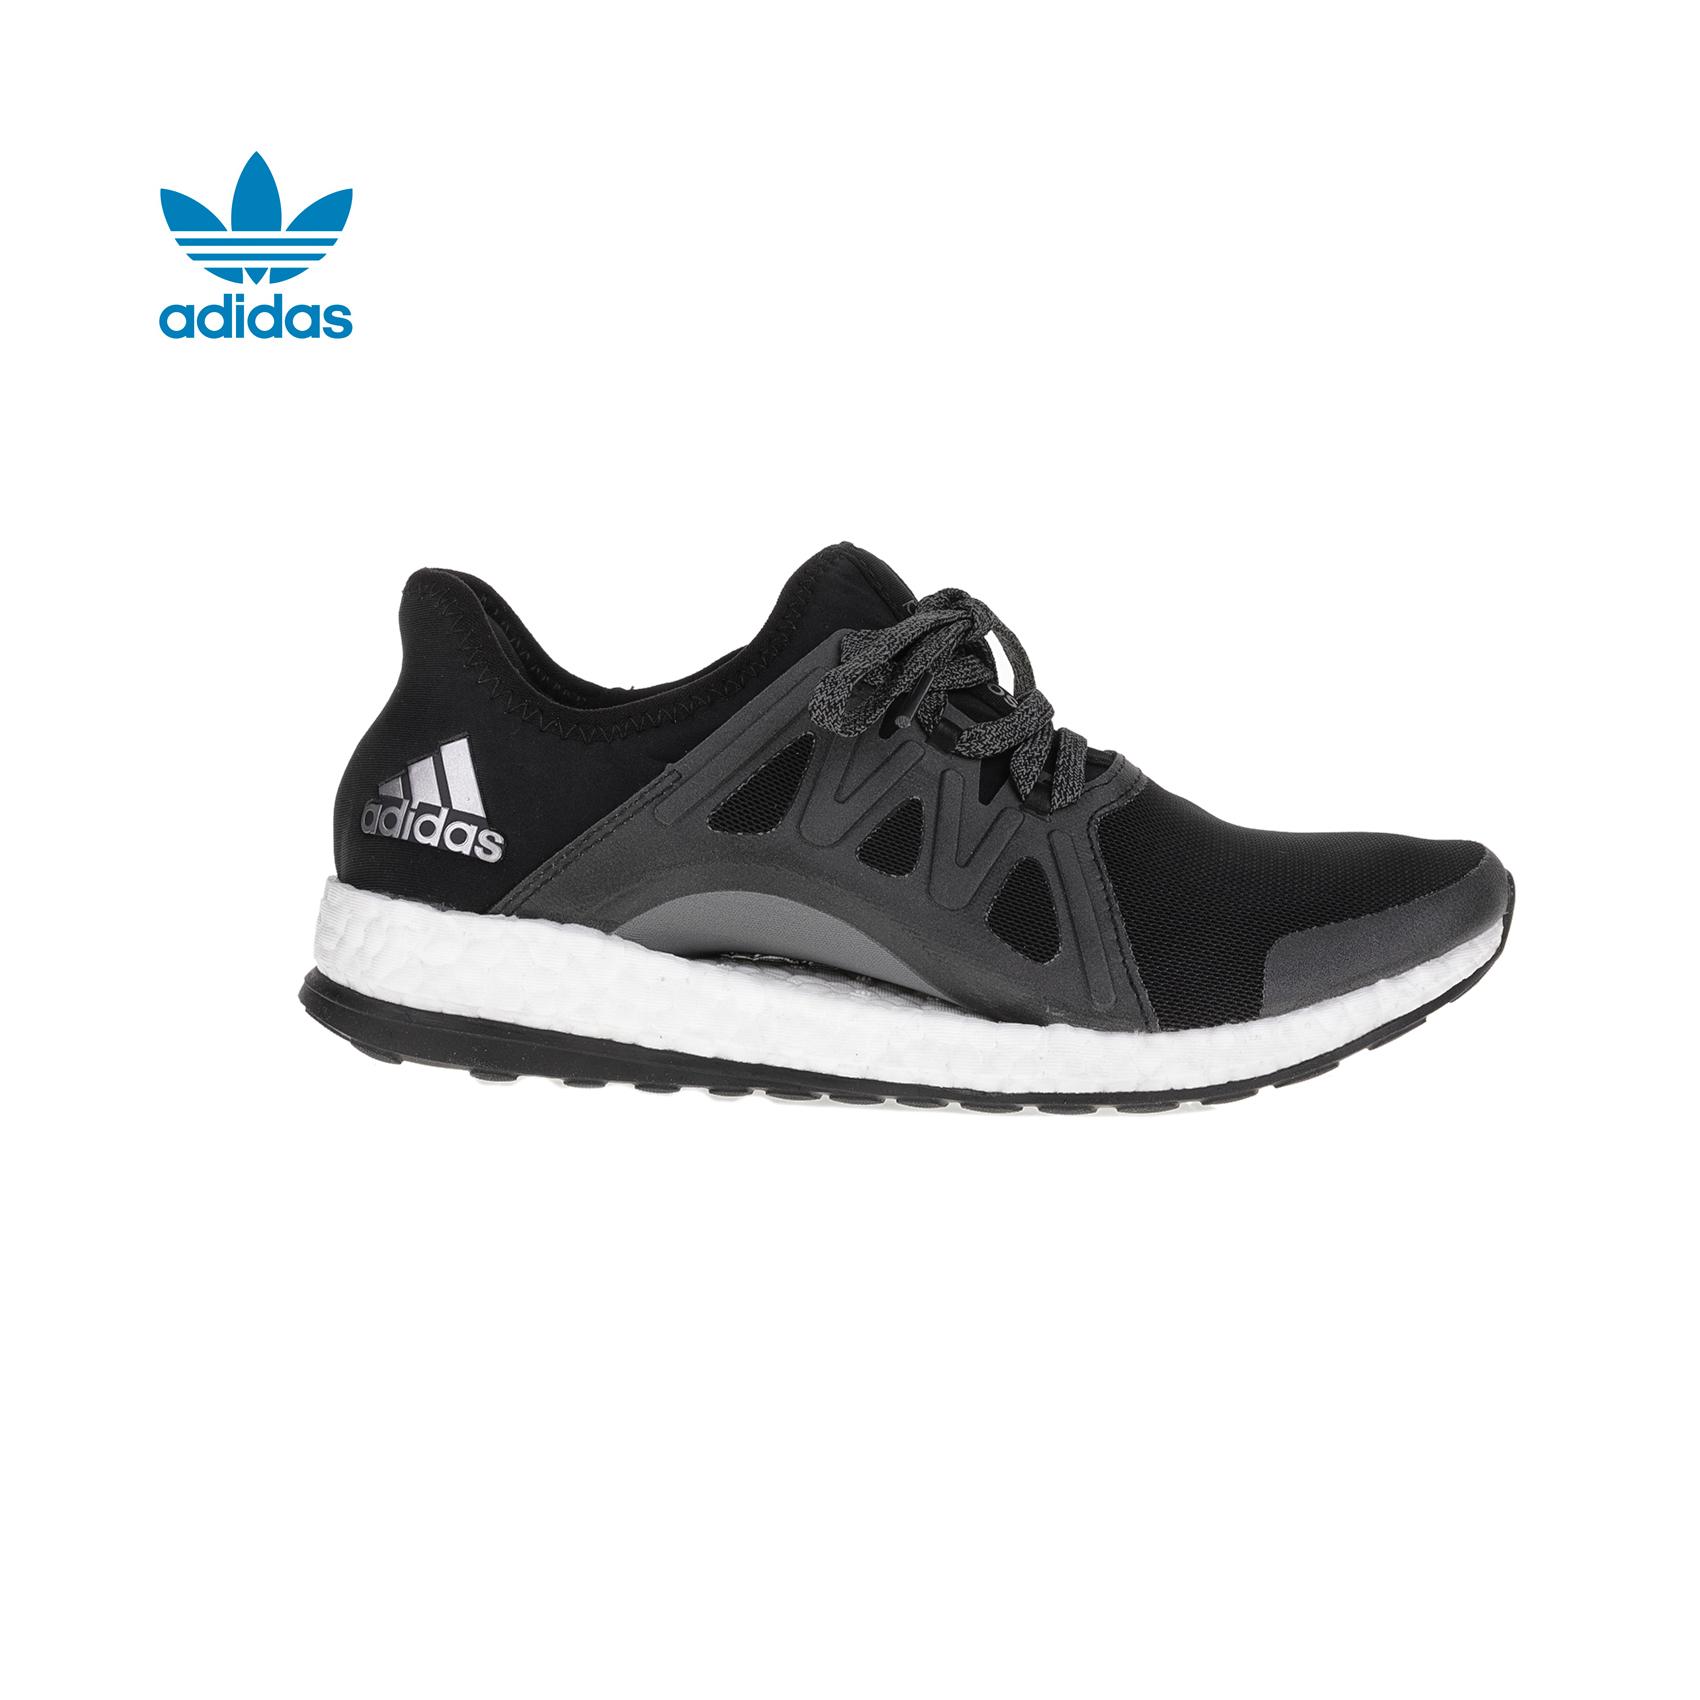 adidas Originals – Γυναικεία παπούτσια adidas PureBOOST X 2 μαύρα